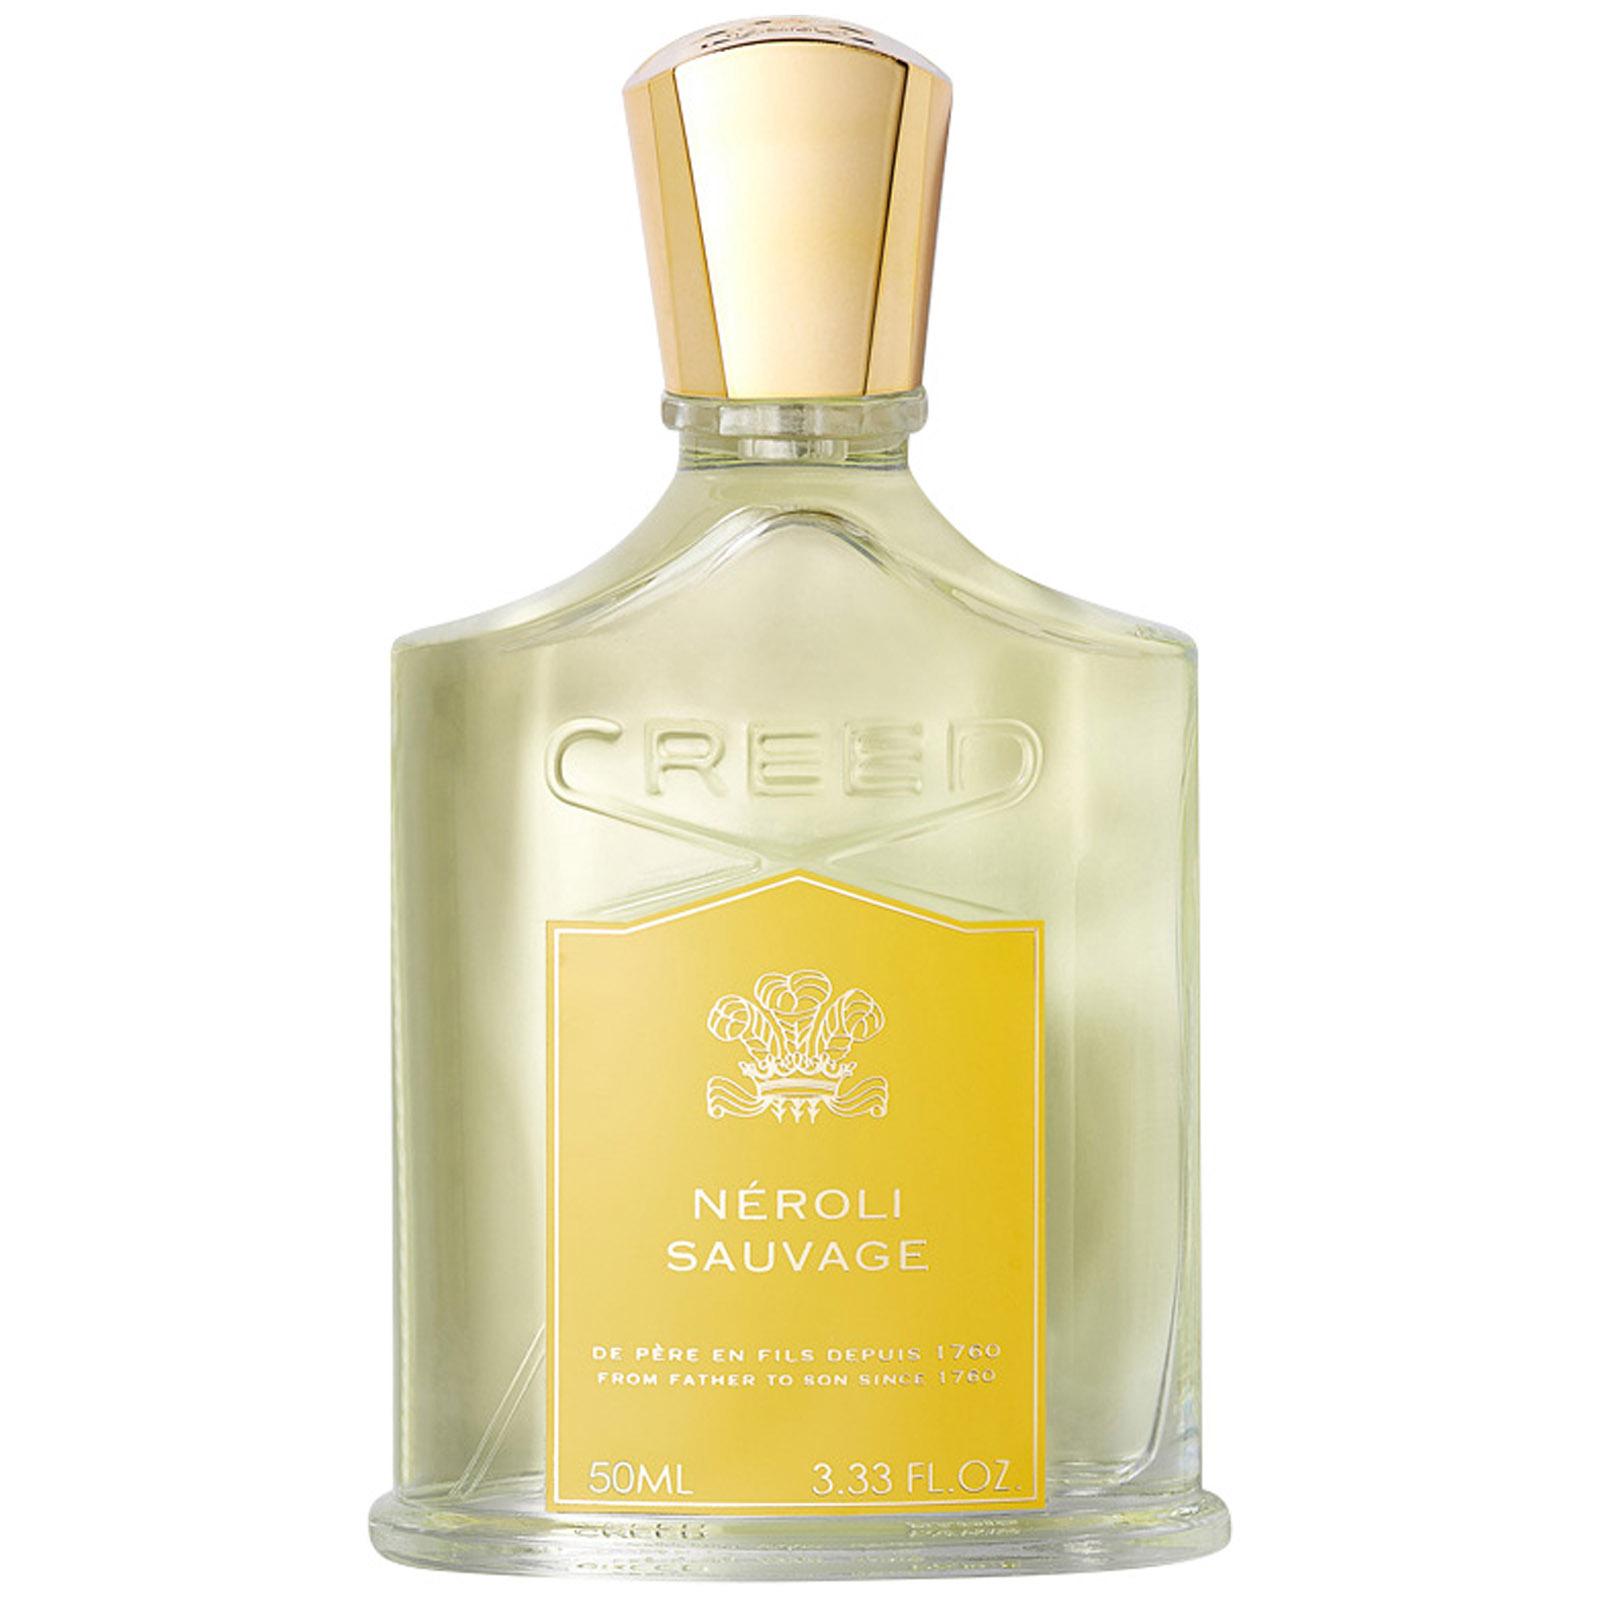 Creed Neroli sauvage millésime perfume eau de parfum 50 ml  - White